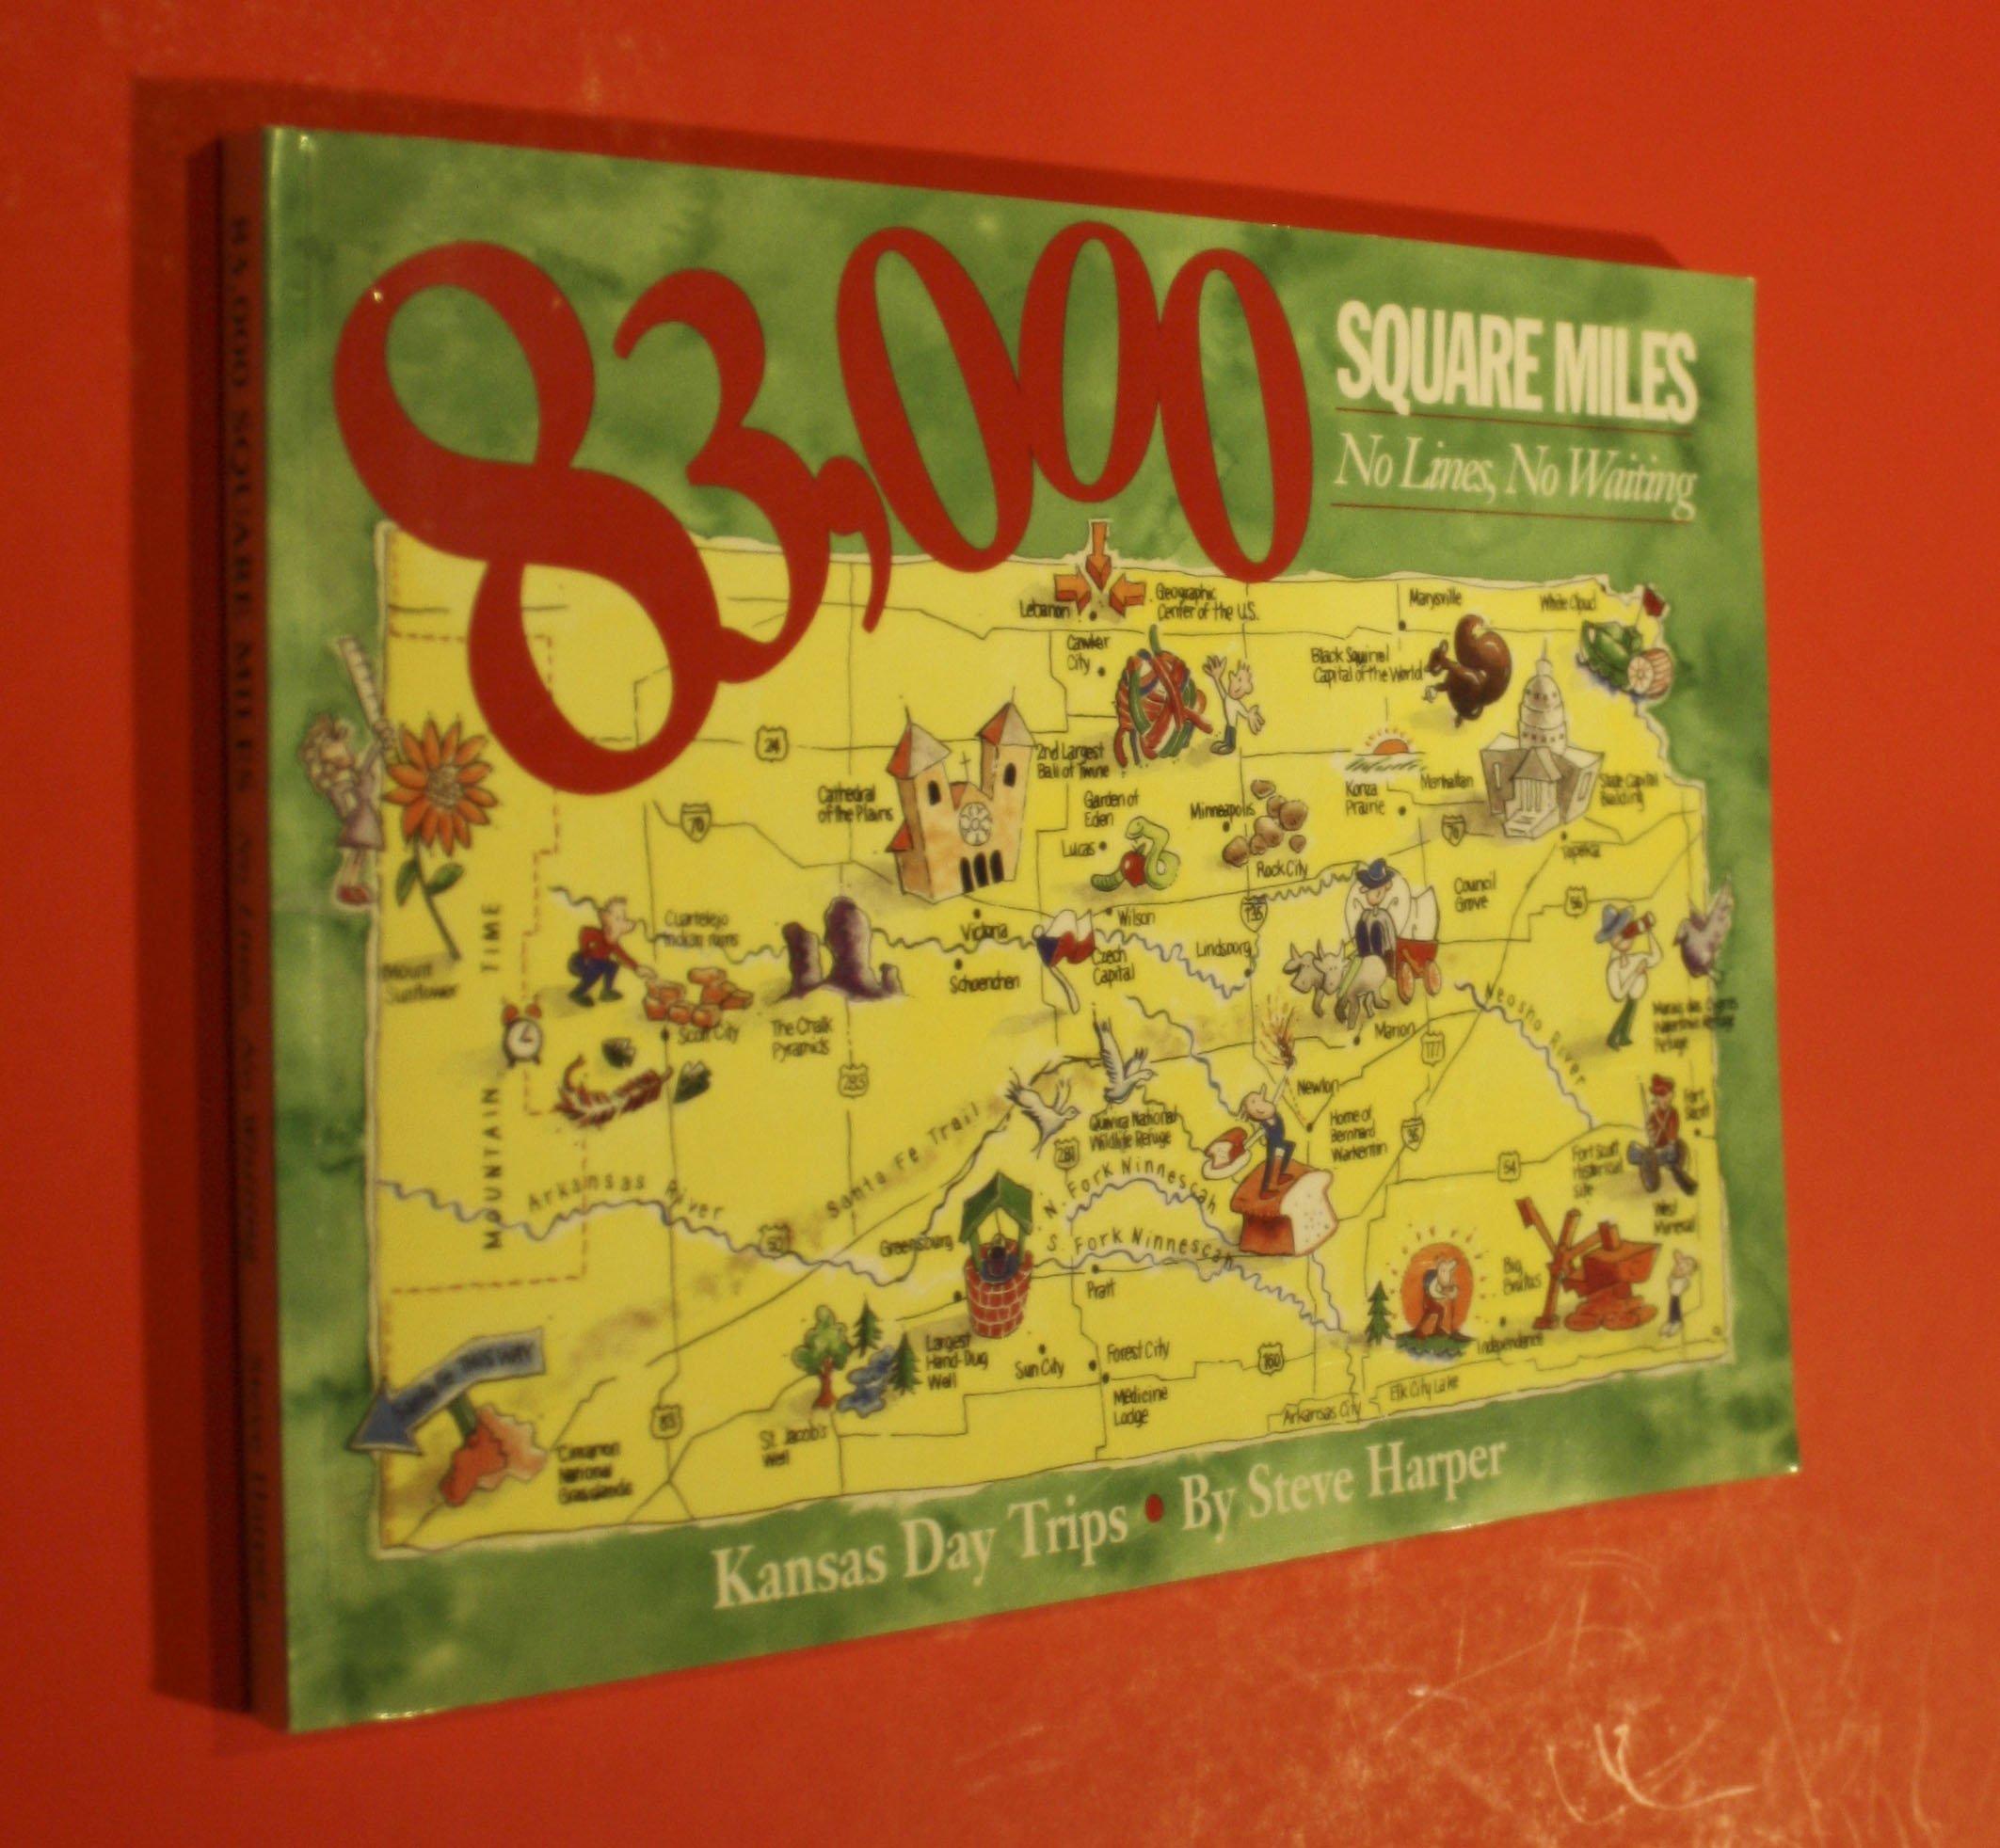 83000 Square Miles Kansas Day Trips: No Lines No Waiting